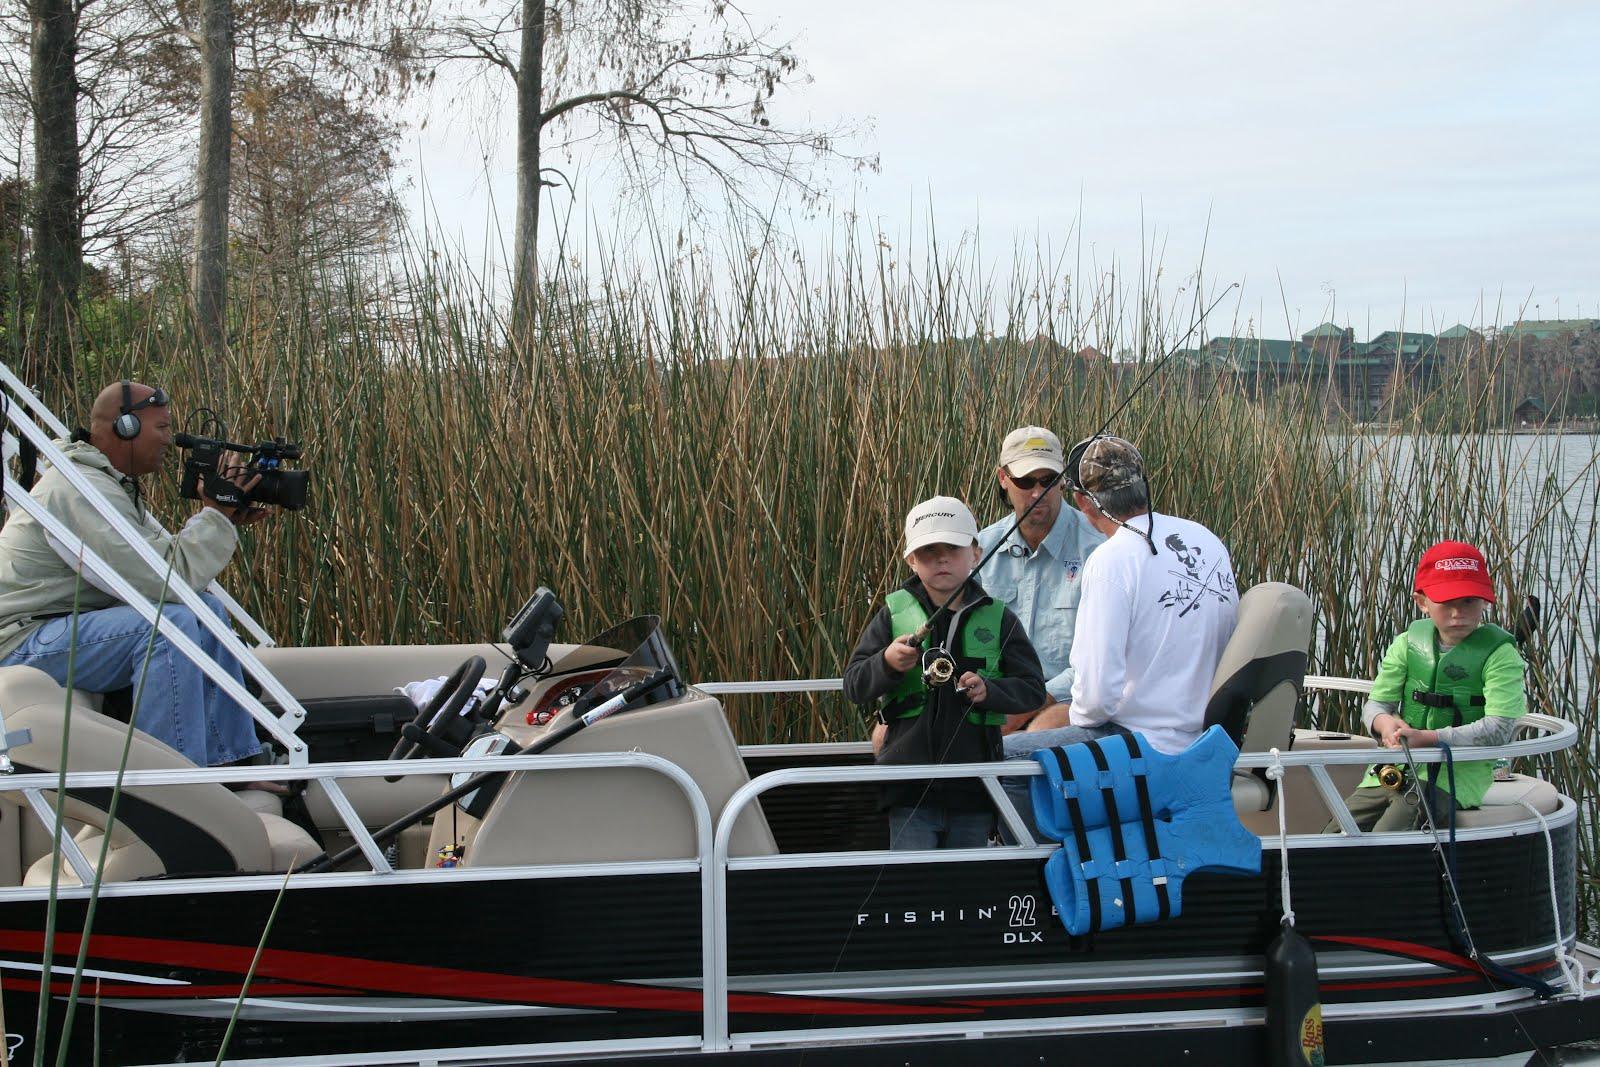 Salt life blog disney bass fishing for Bass fishing disney world